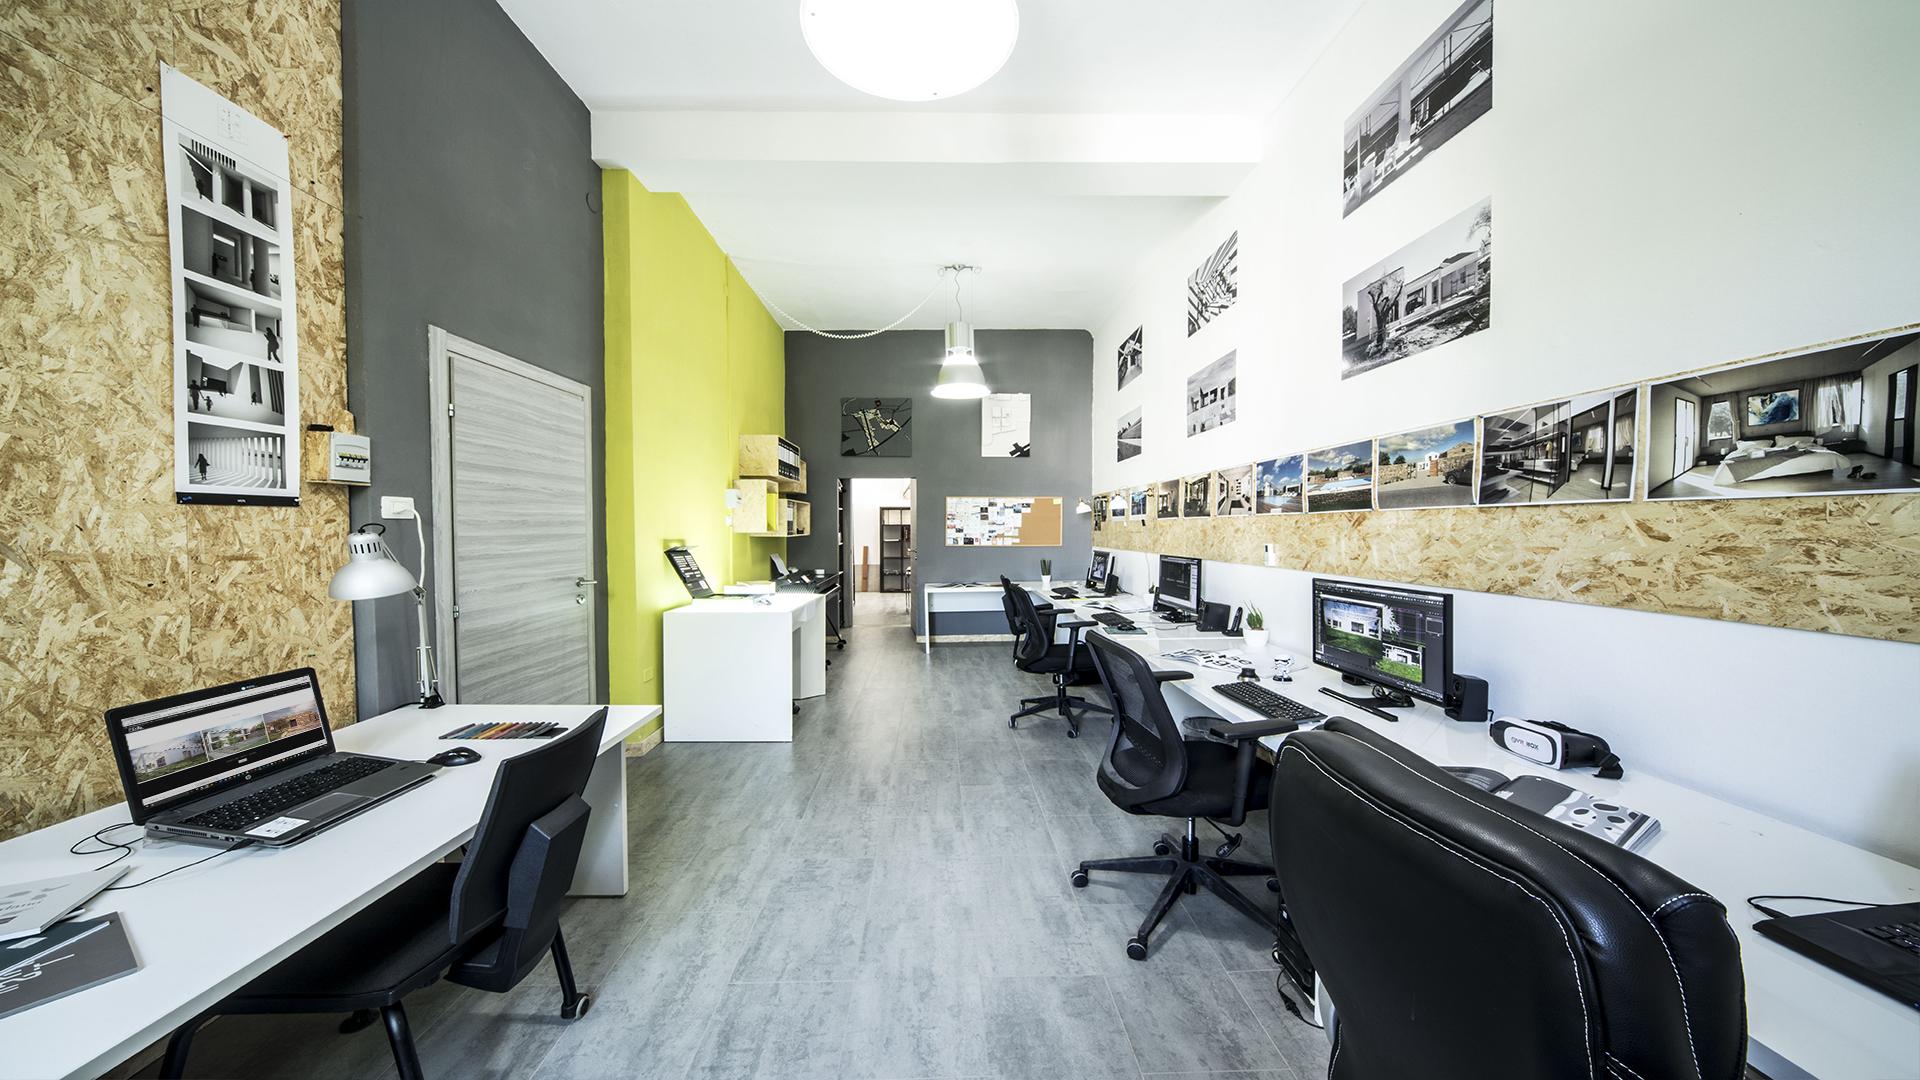 Studio architettura alghero Pixel (9)